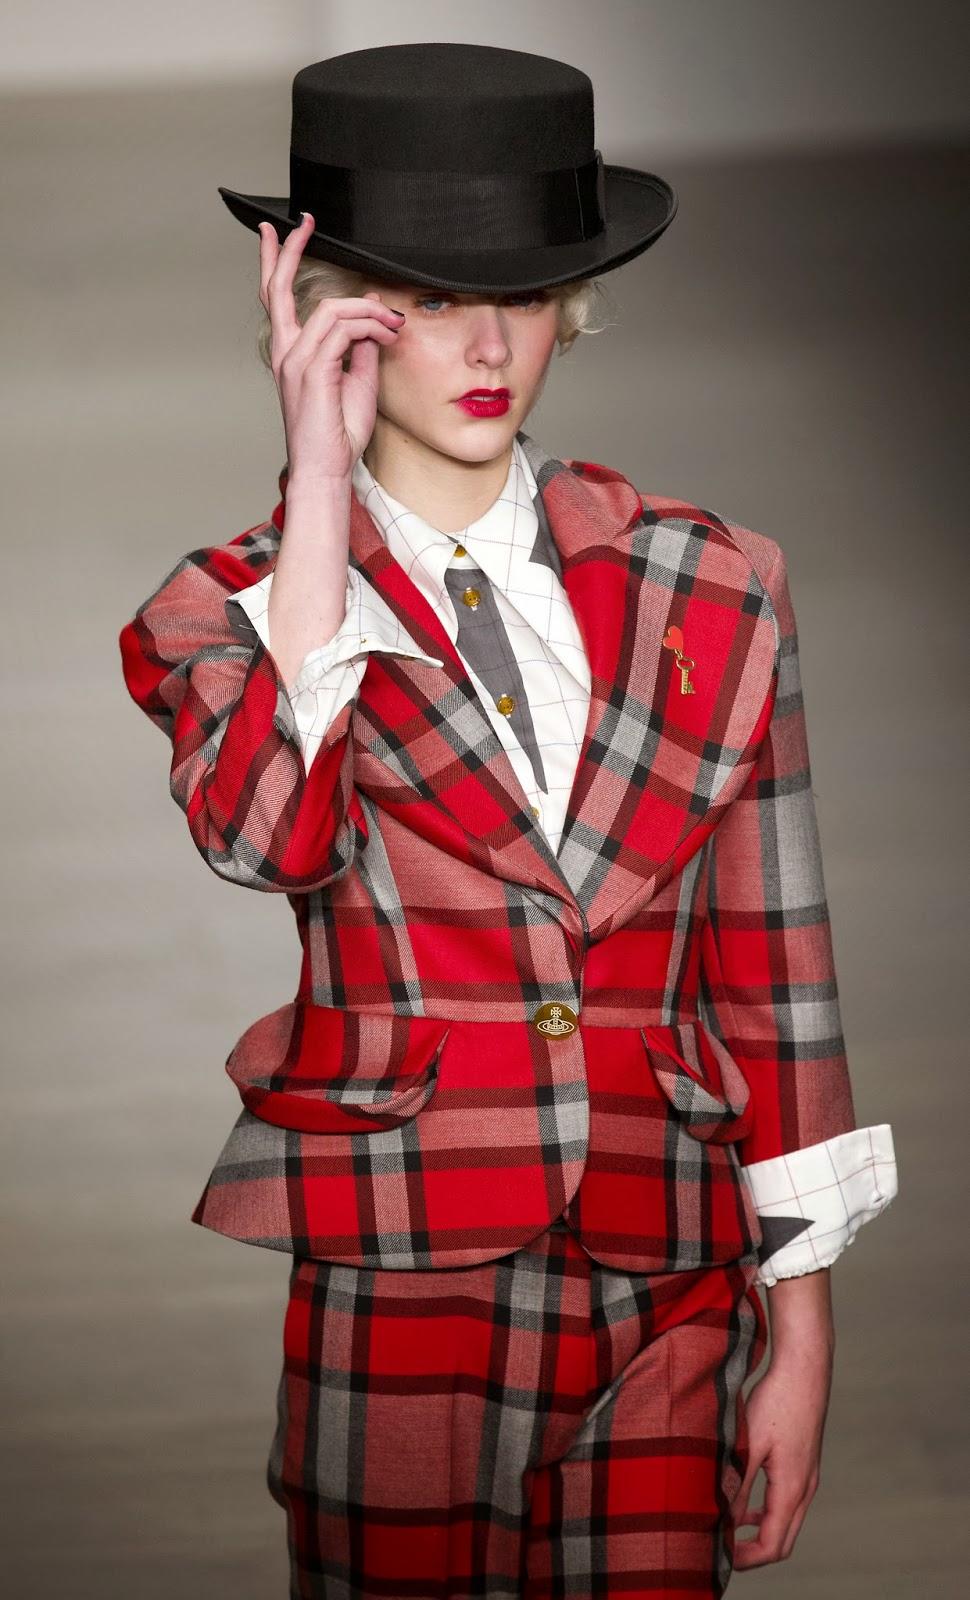 Autumn, Britain, Collections, Creation, Designer, Emilia Wickstead, Fashion, Fashion 2014, John Rocha, London, London Fashion Week, Mercedes-Benz, Model, Red Label, Showbiz, UK, Winter,